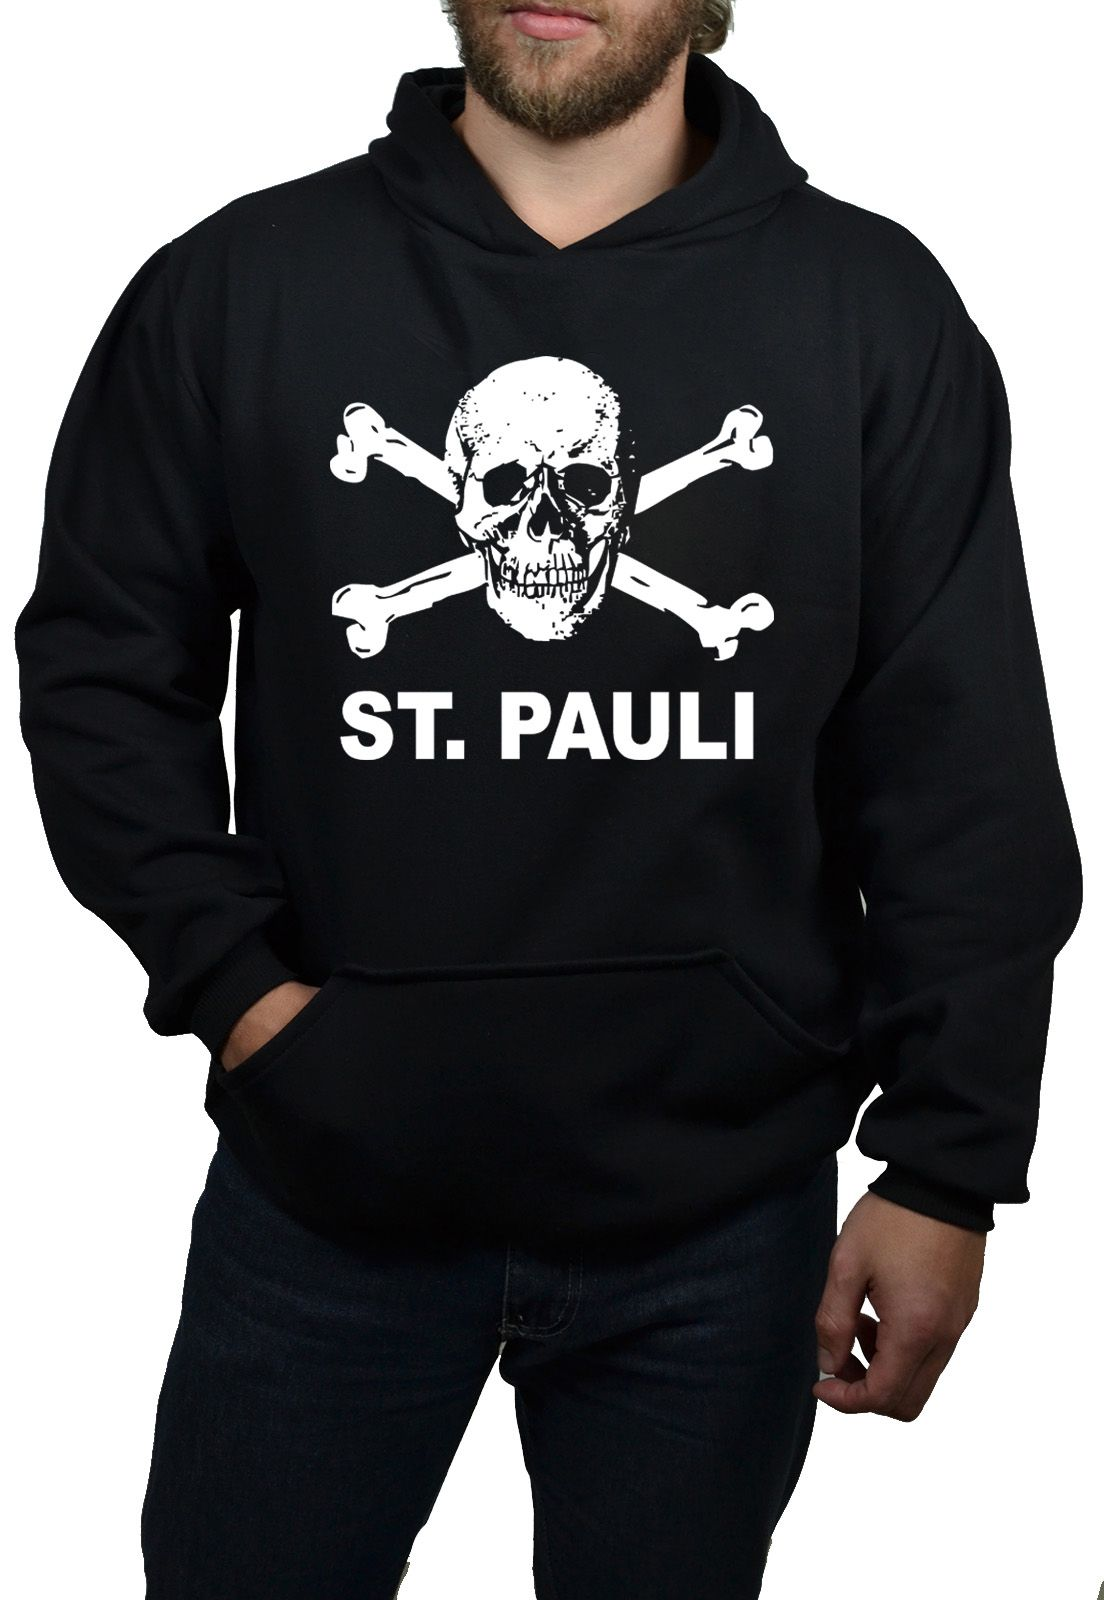 Moletom Hshop St. Pauli - Preto  - HShop